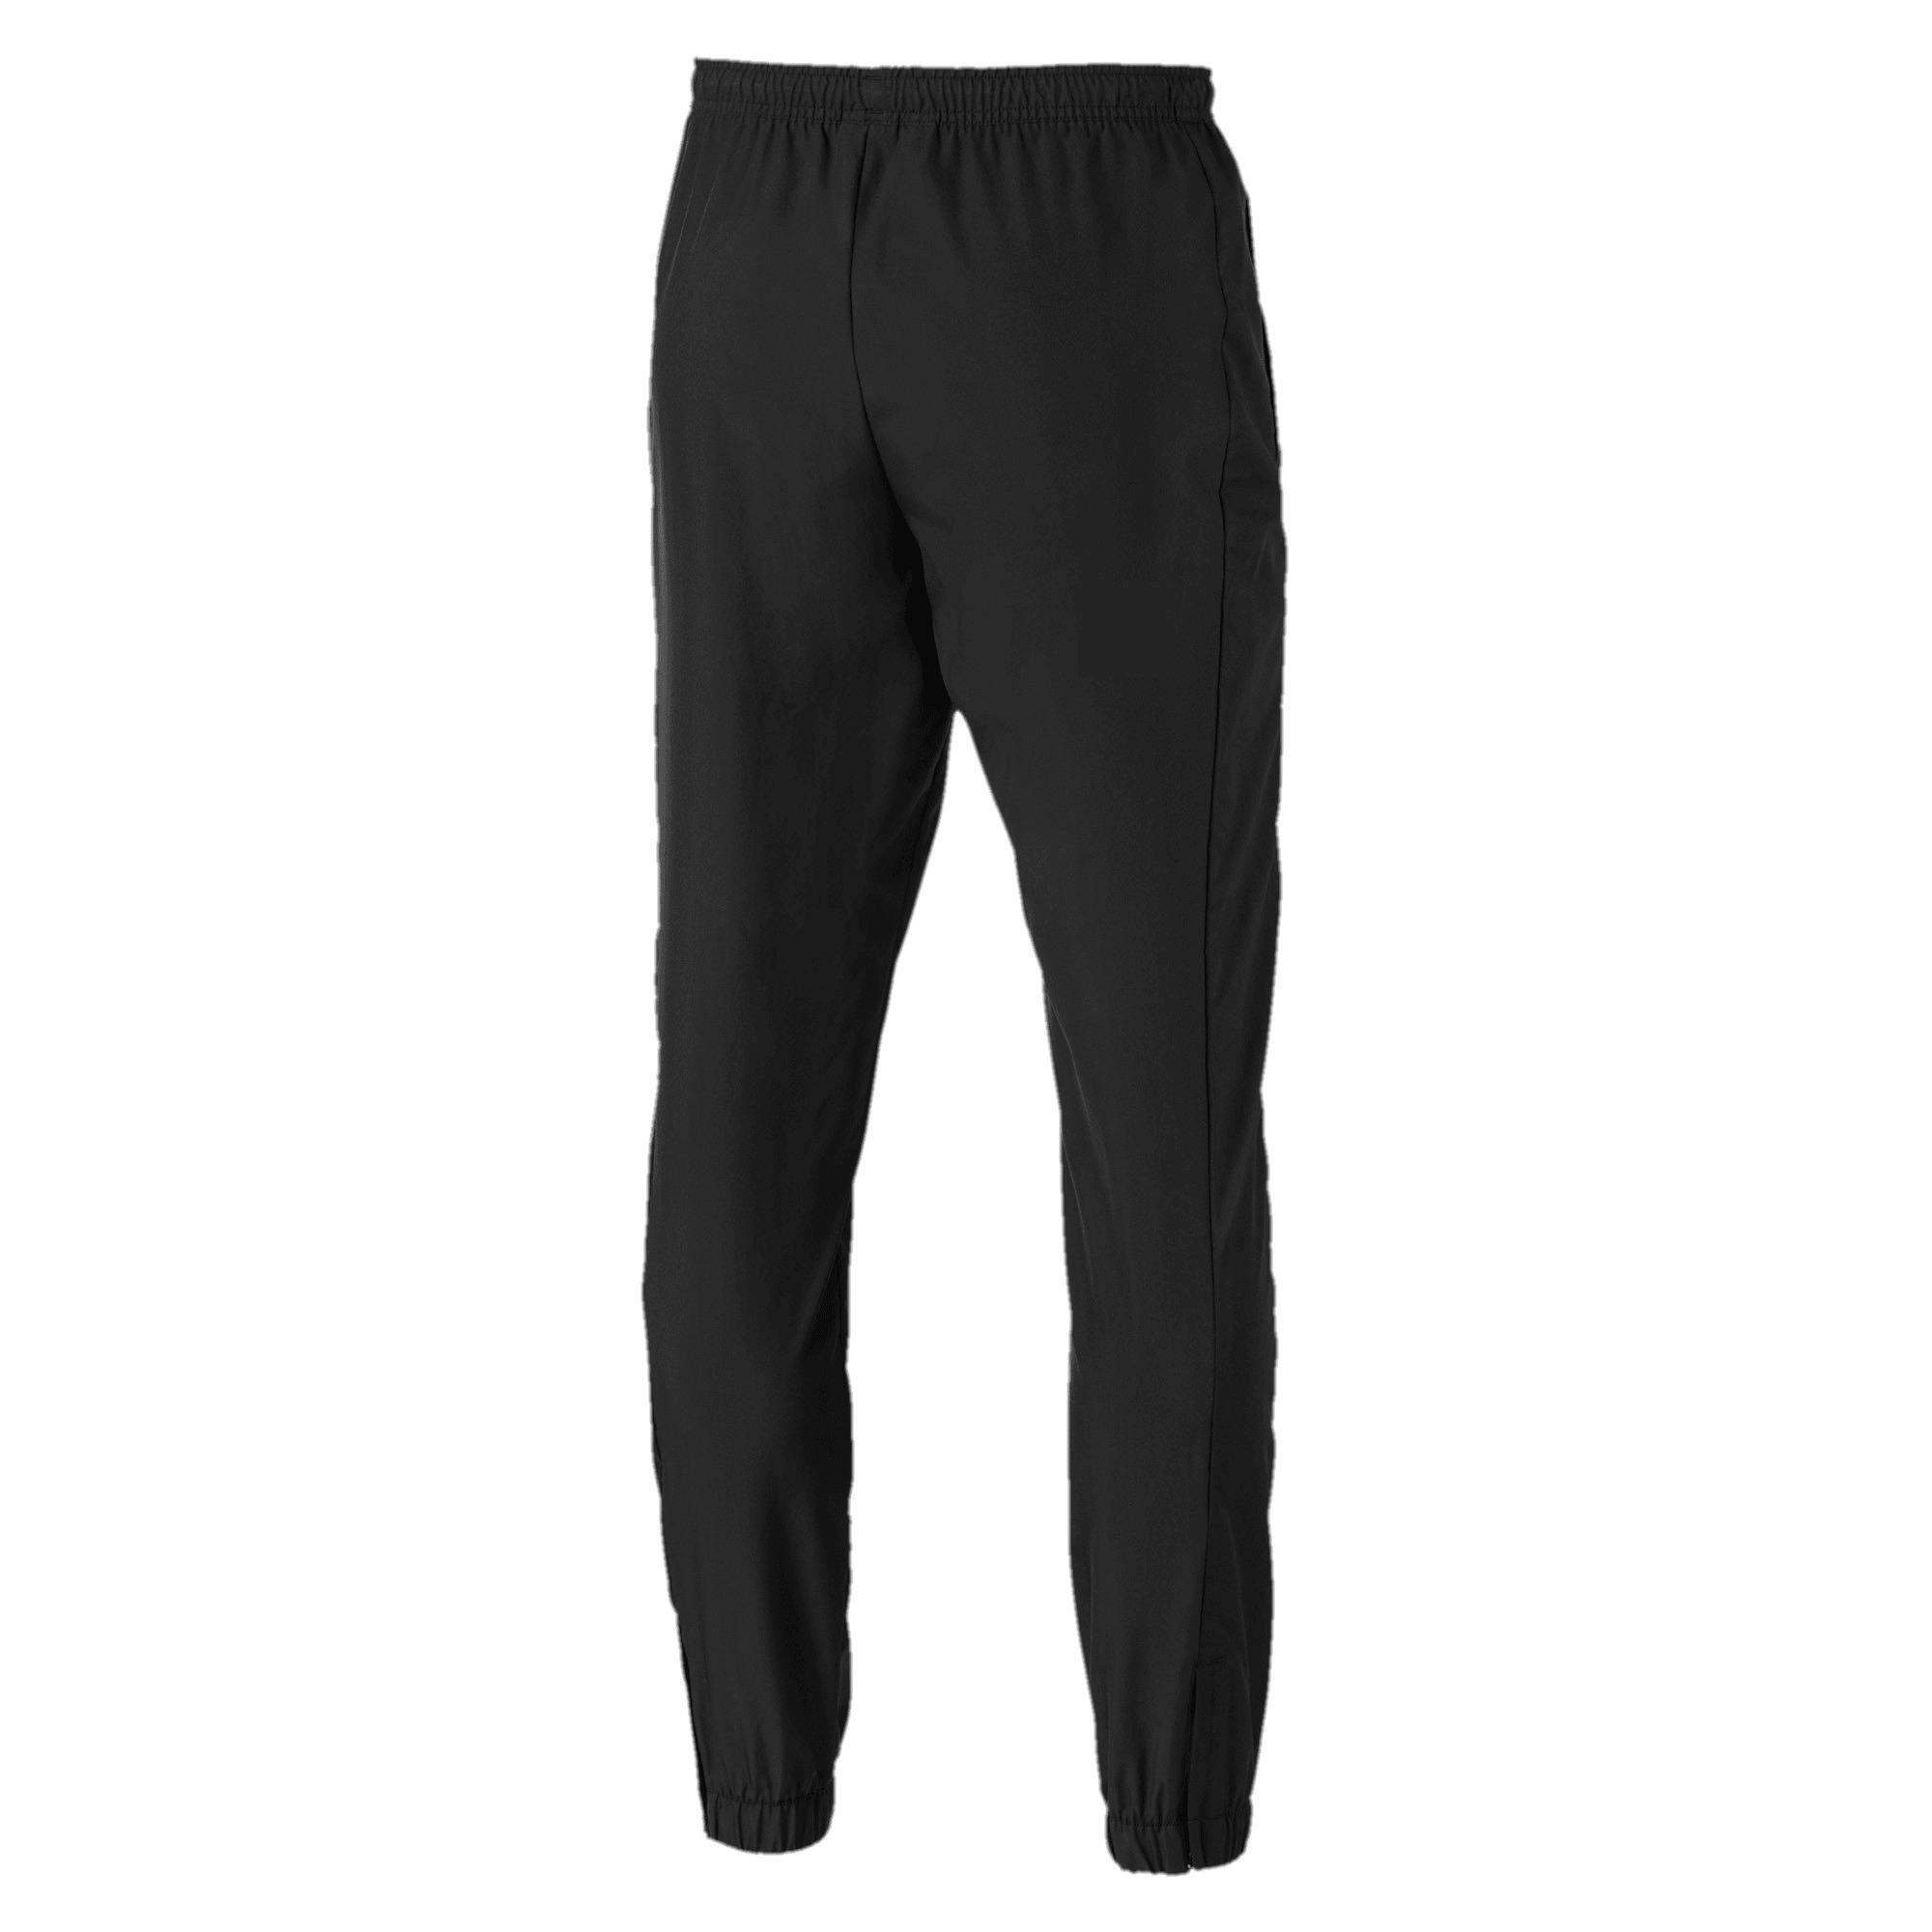 Miniatura 2 de Pantalones de punto BMW M Motorsport para hombre, Puma Black, mediano